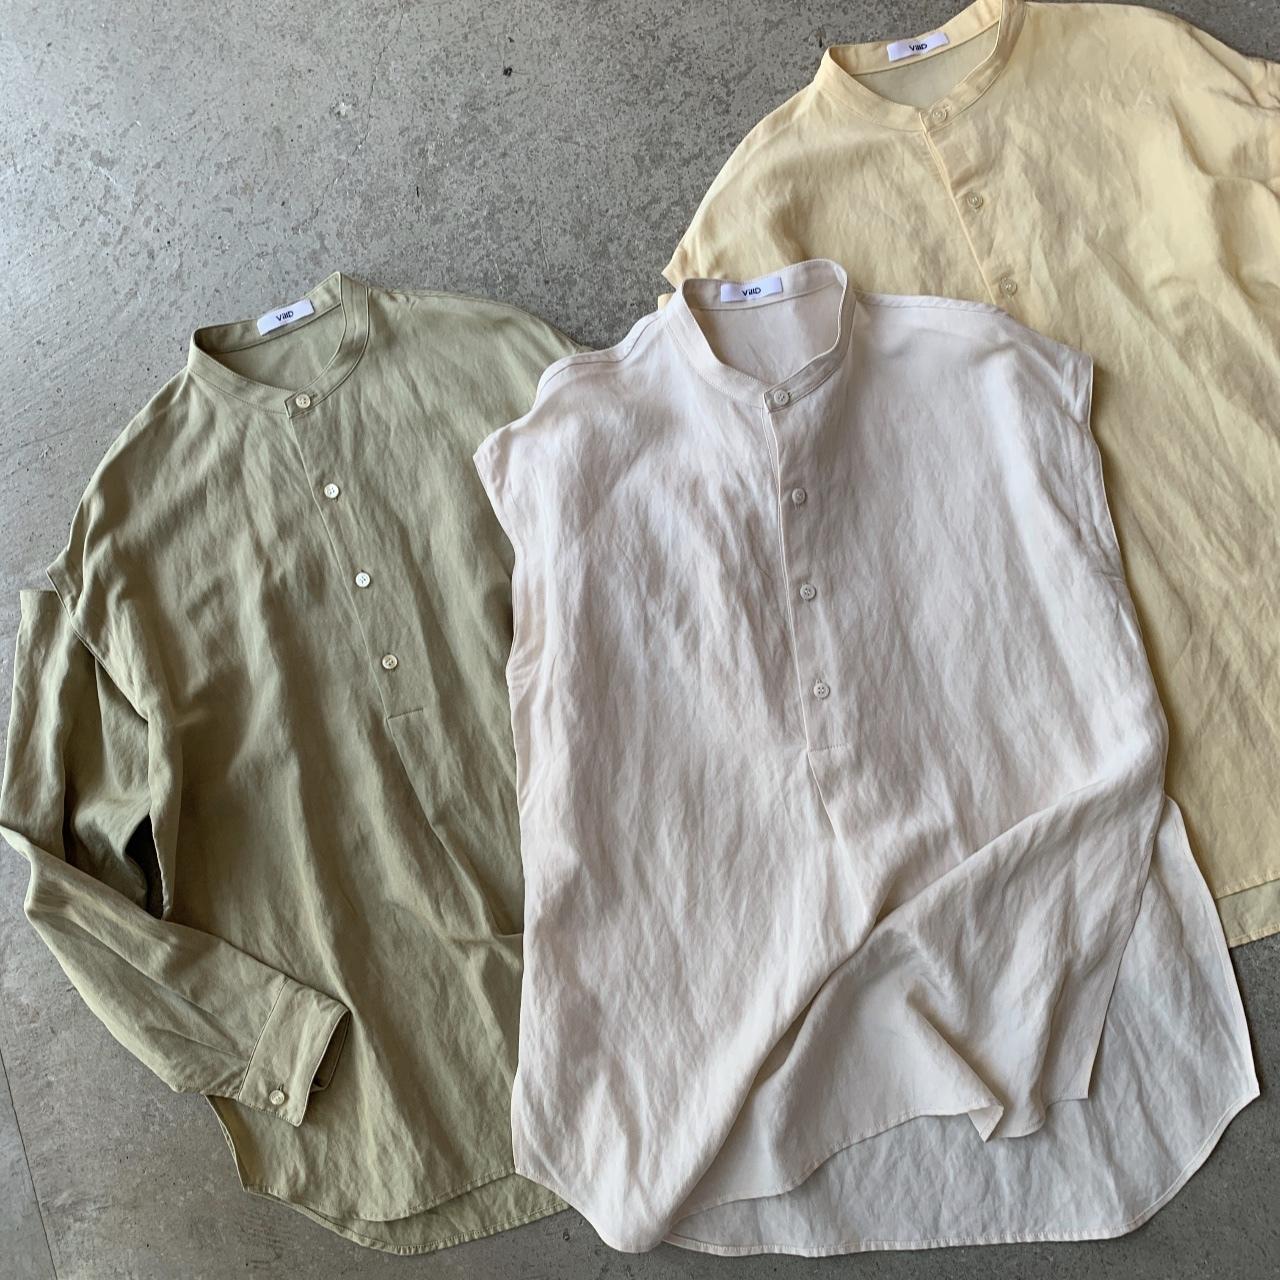 VillD - rayon linen tumbler shirt